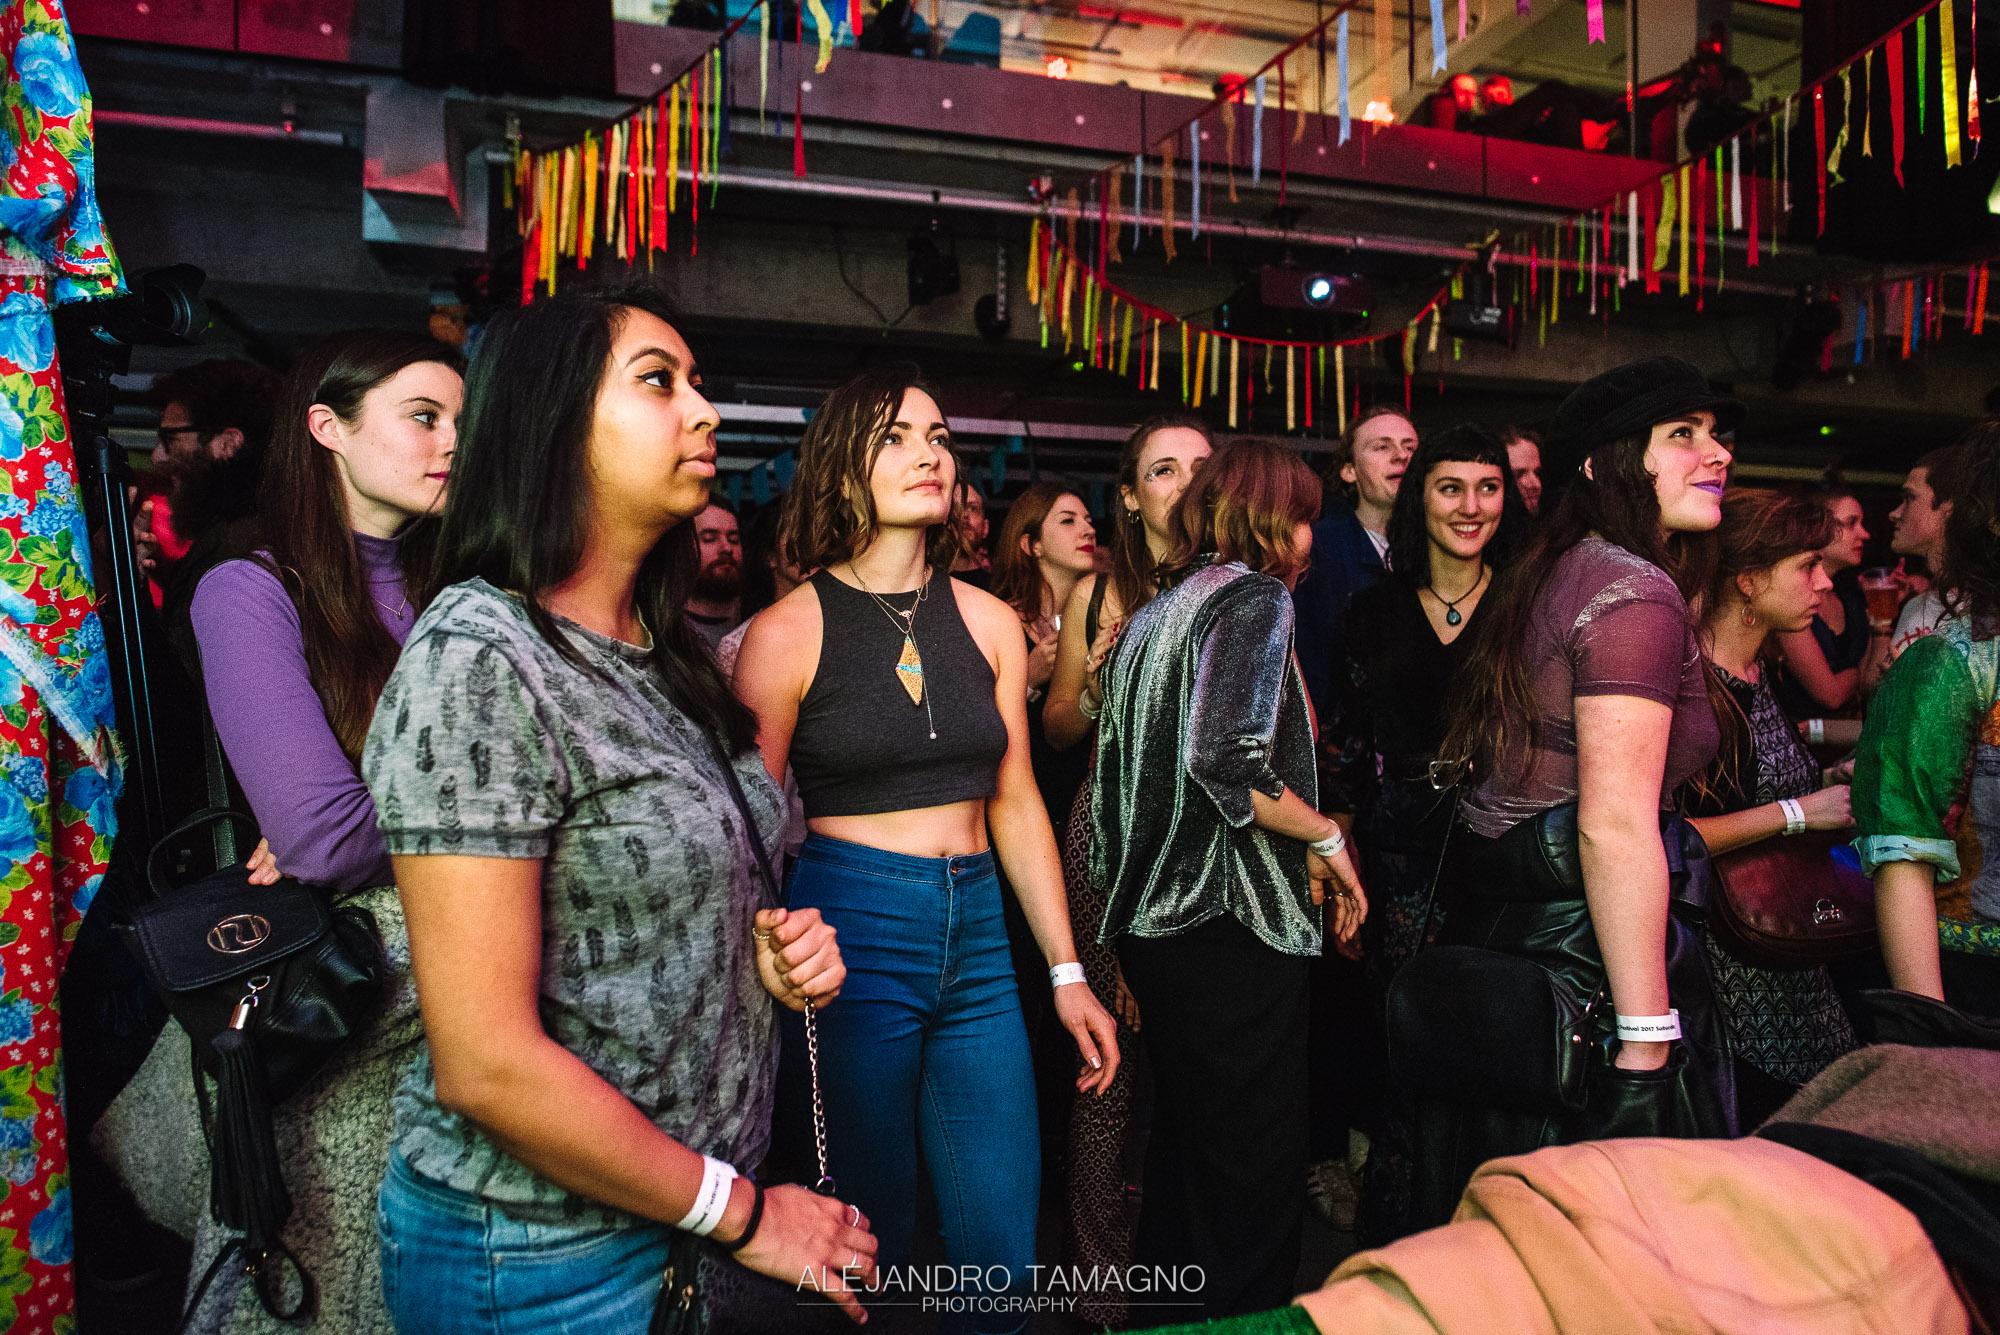 © Alejandro Tamagno 2017_London Remixed Festival_Saturday 0144_.jpg